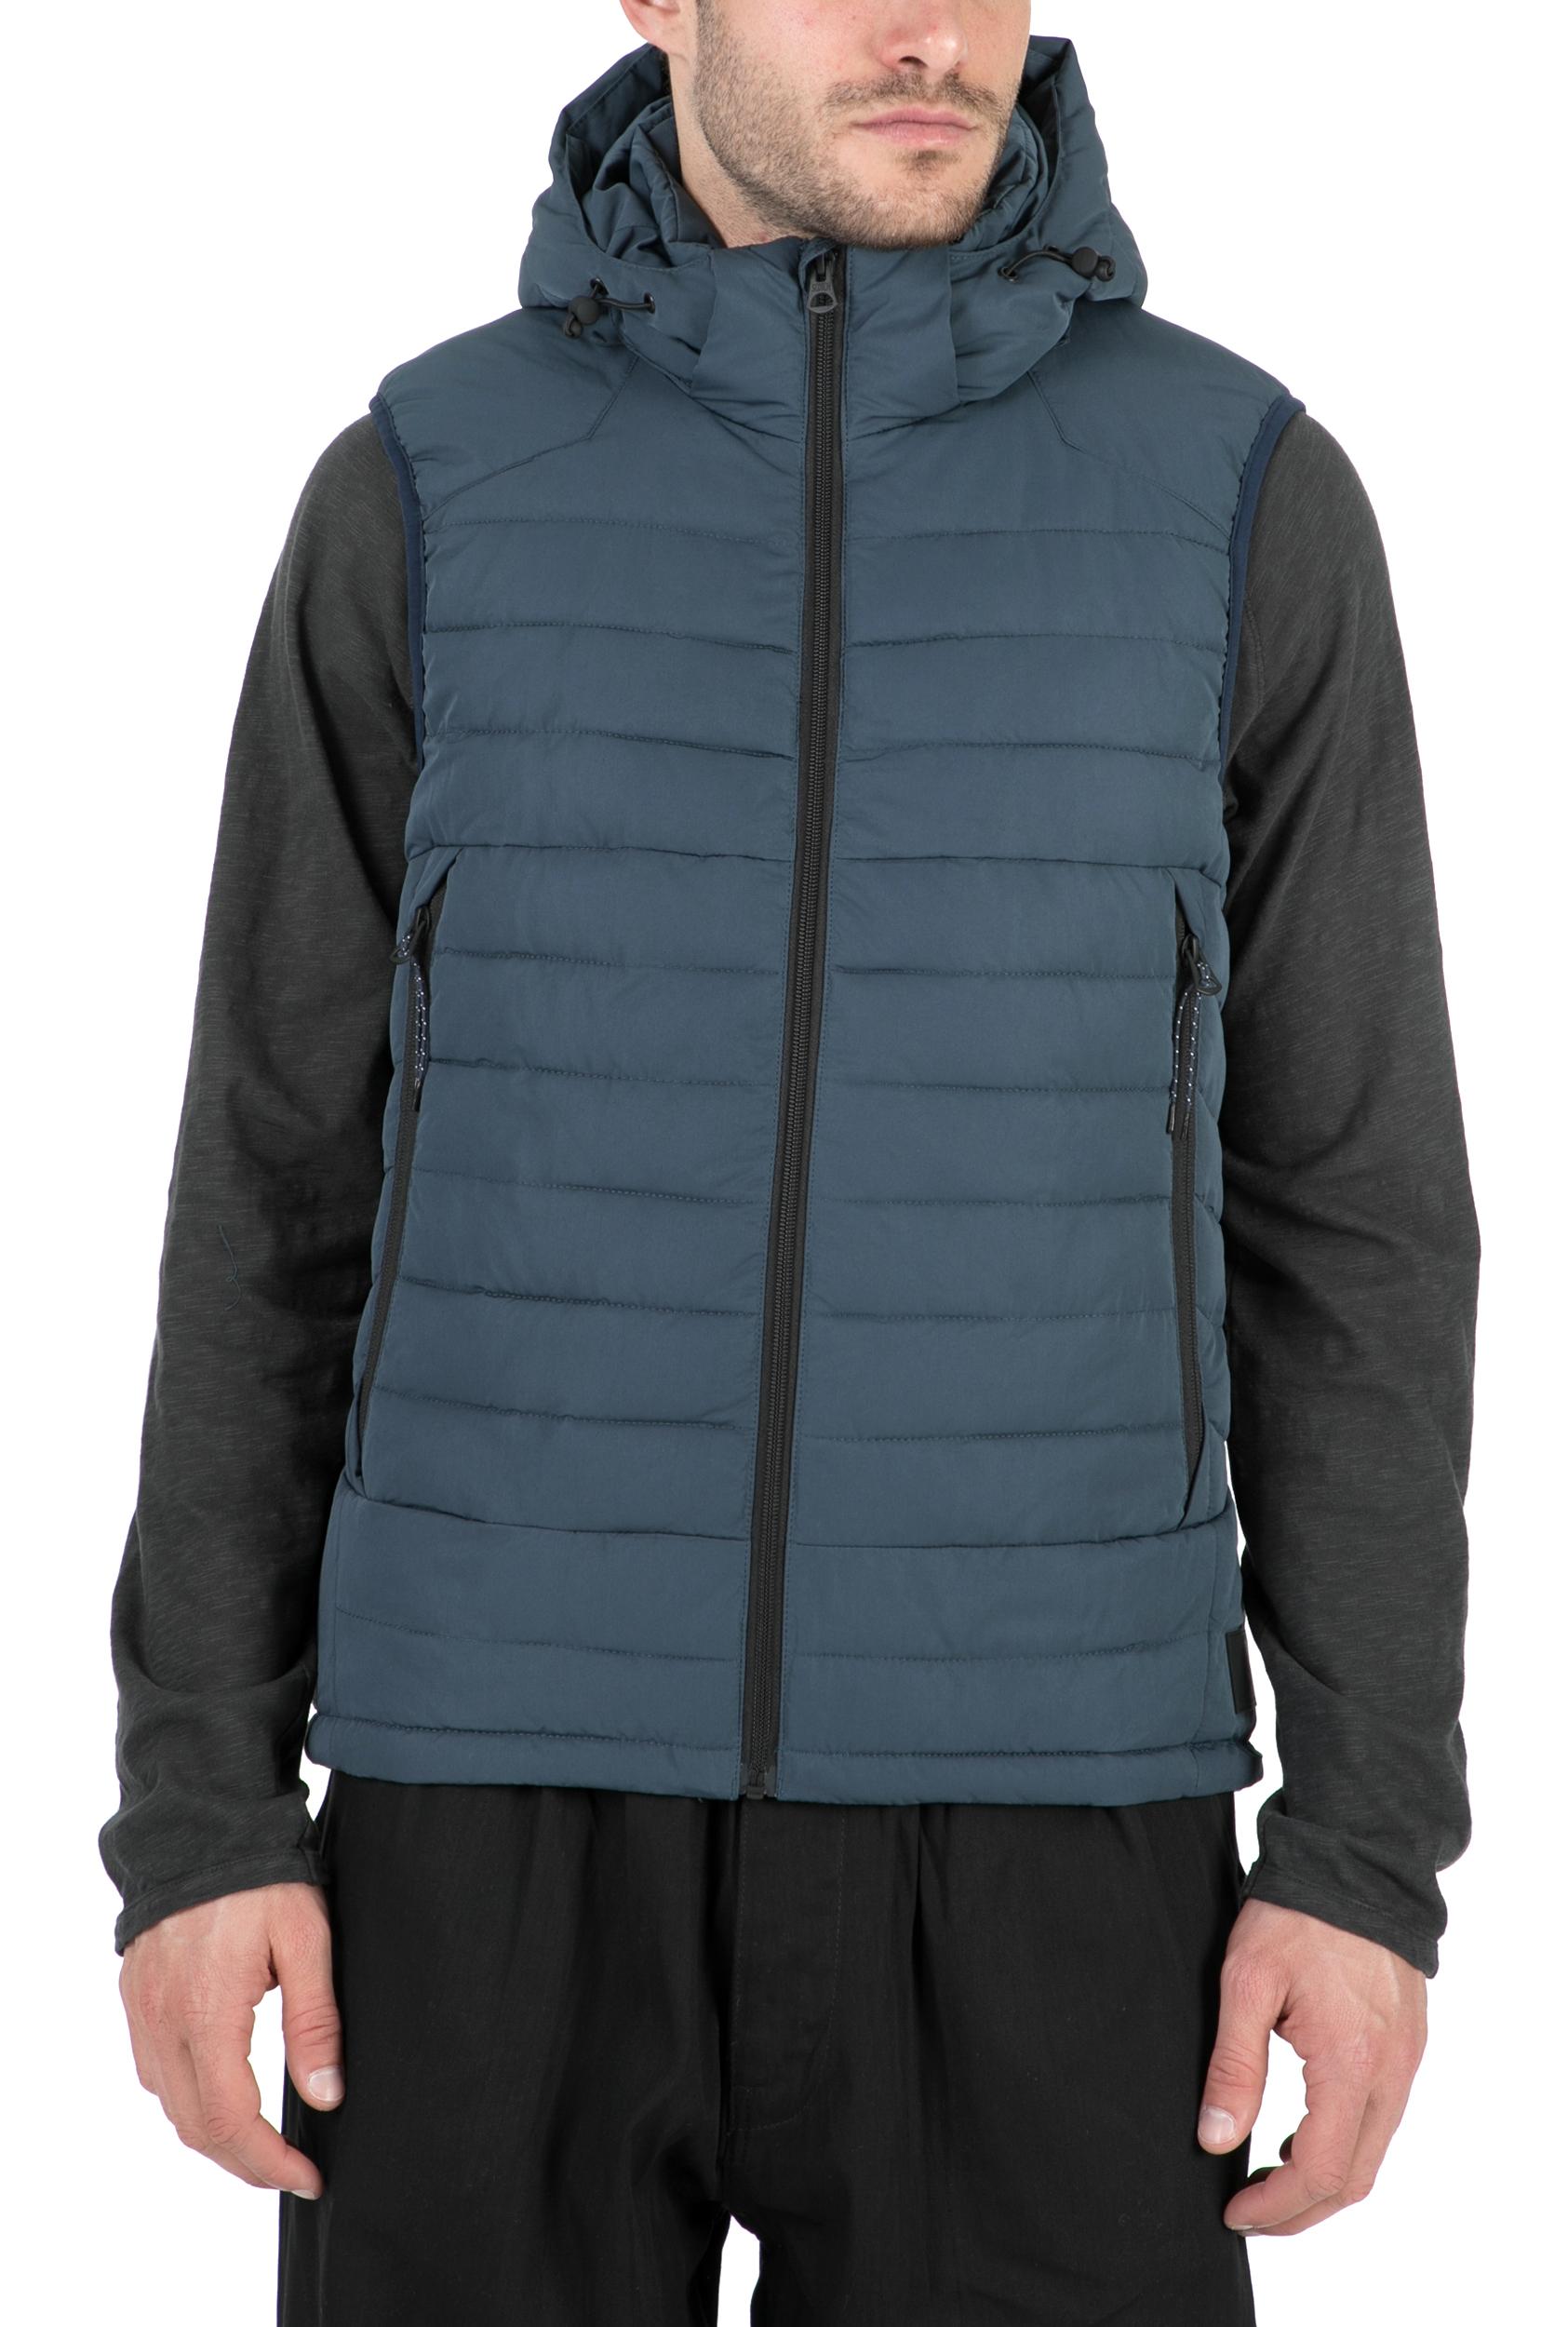 SCOTCH & SODA - Ανδρικό αμάνικο μπουφάν SCOTCH & SODA μπλε ανδρικά ρούχα πανωφόρια αμάνικα μπουφάν